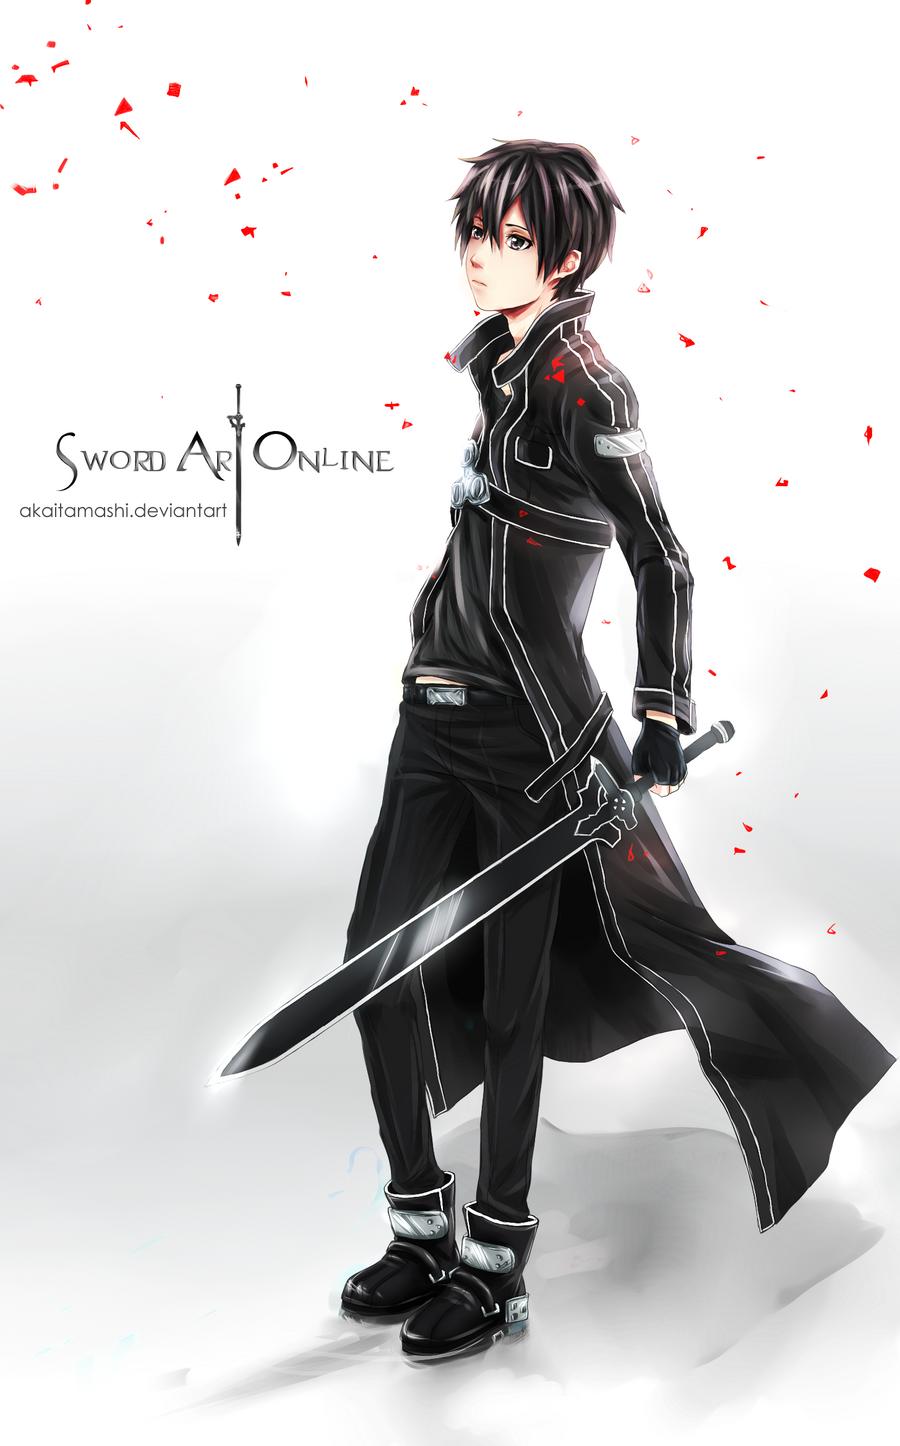 Sword Art Online: Kirito by akaitamashi on DeviantArt